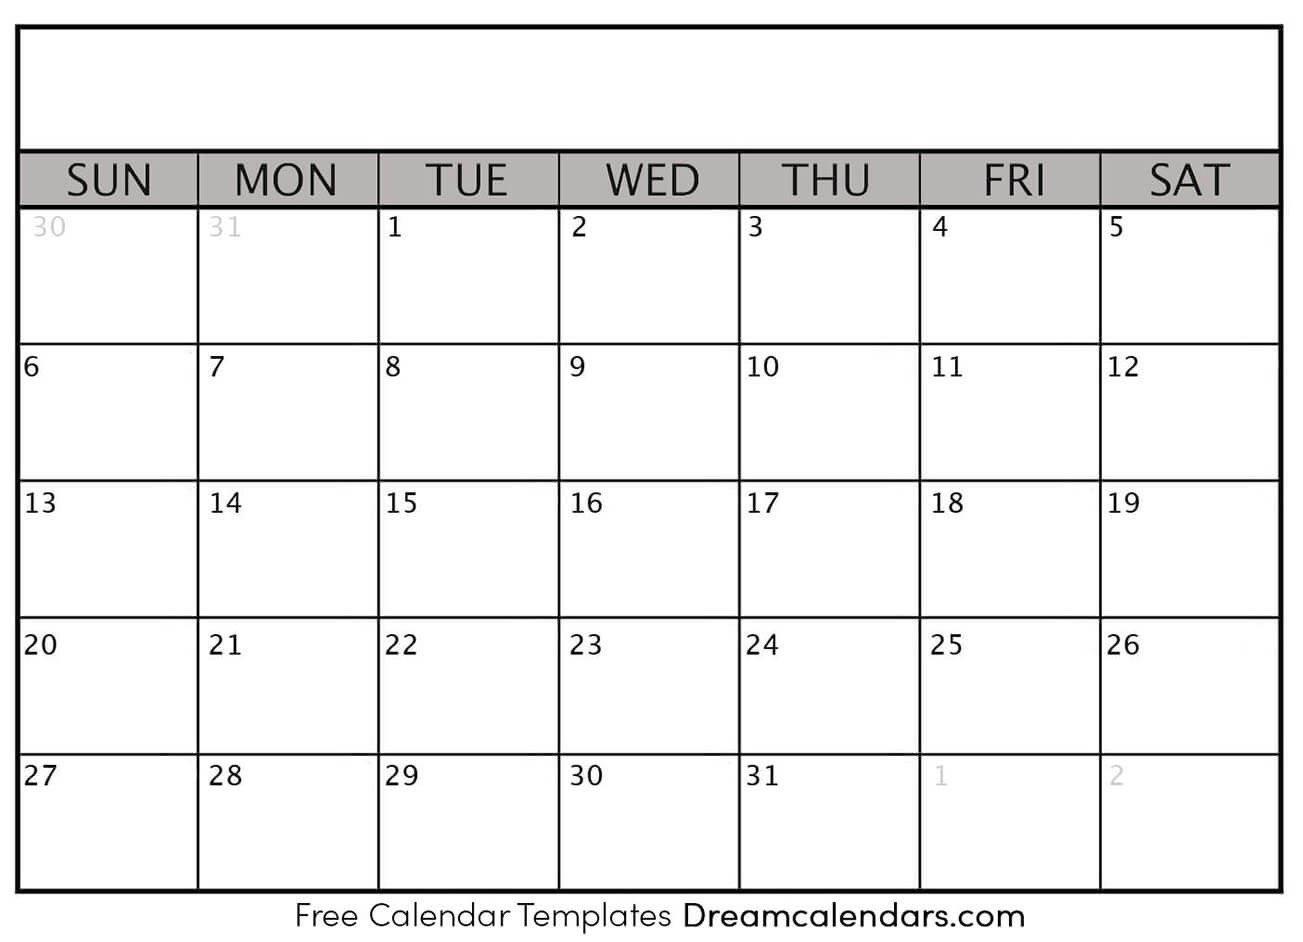 Blank Printable Calendar Template Printable Blank Calendar Dream Calendars